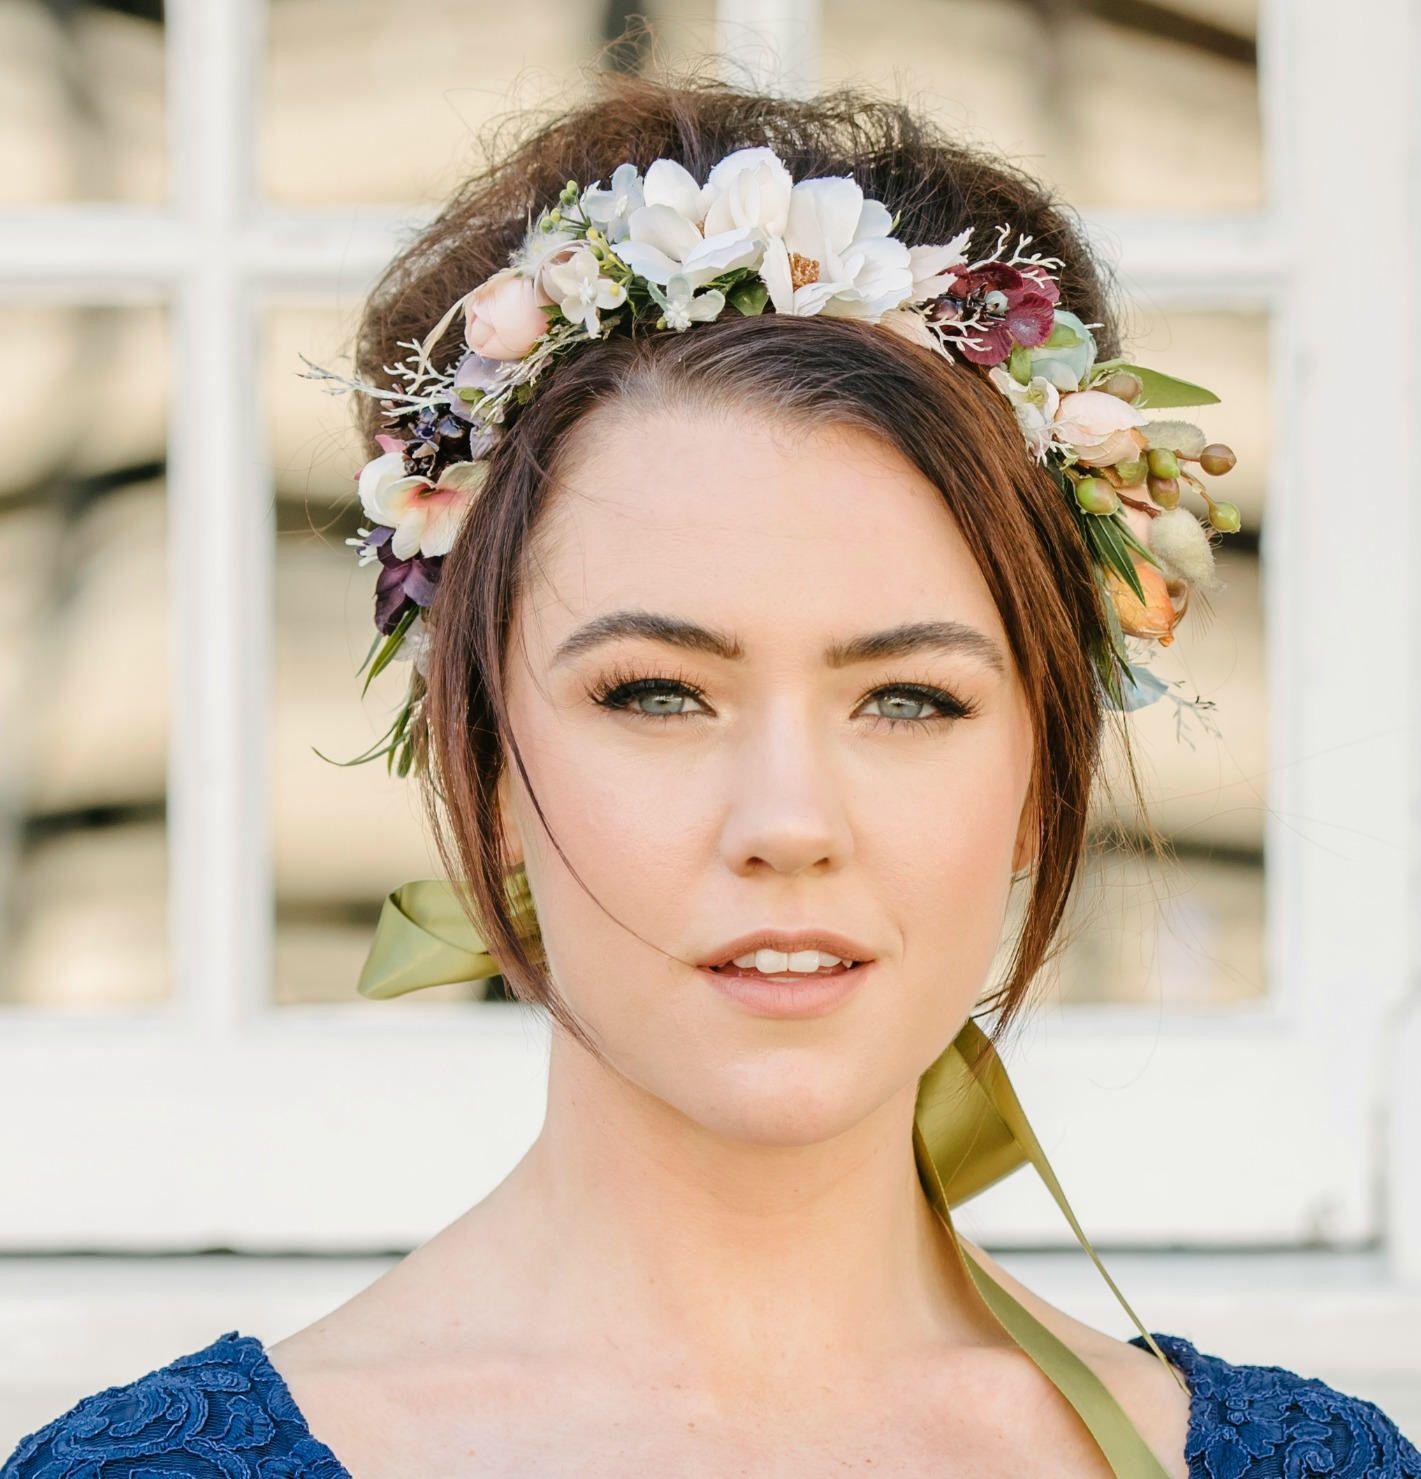 Woodland Rustic Flower Crown Headband Green Flower Headpiece Floral Crown Wedding Flower Crown Wedding Hair Wreath Blue Mauve Maroon Flowers #crownheadband